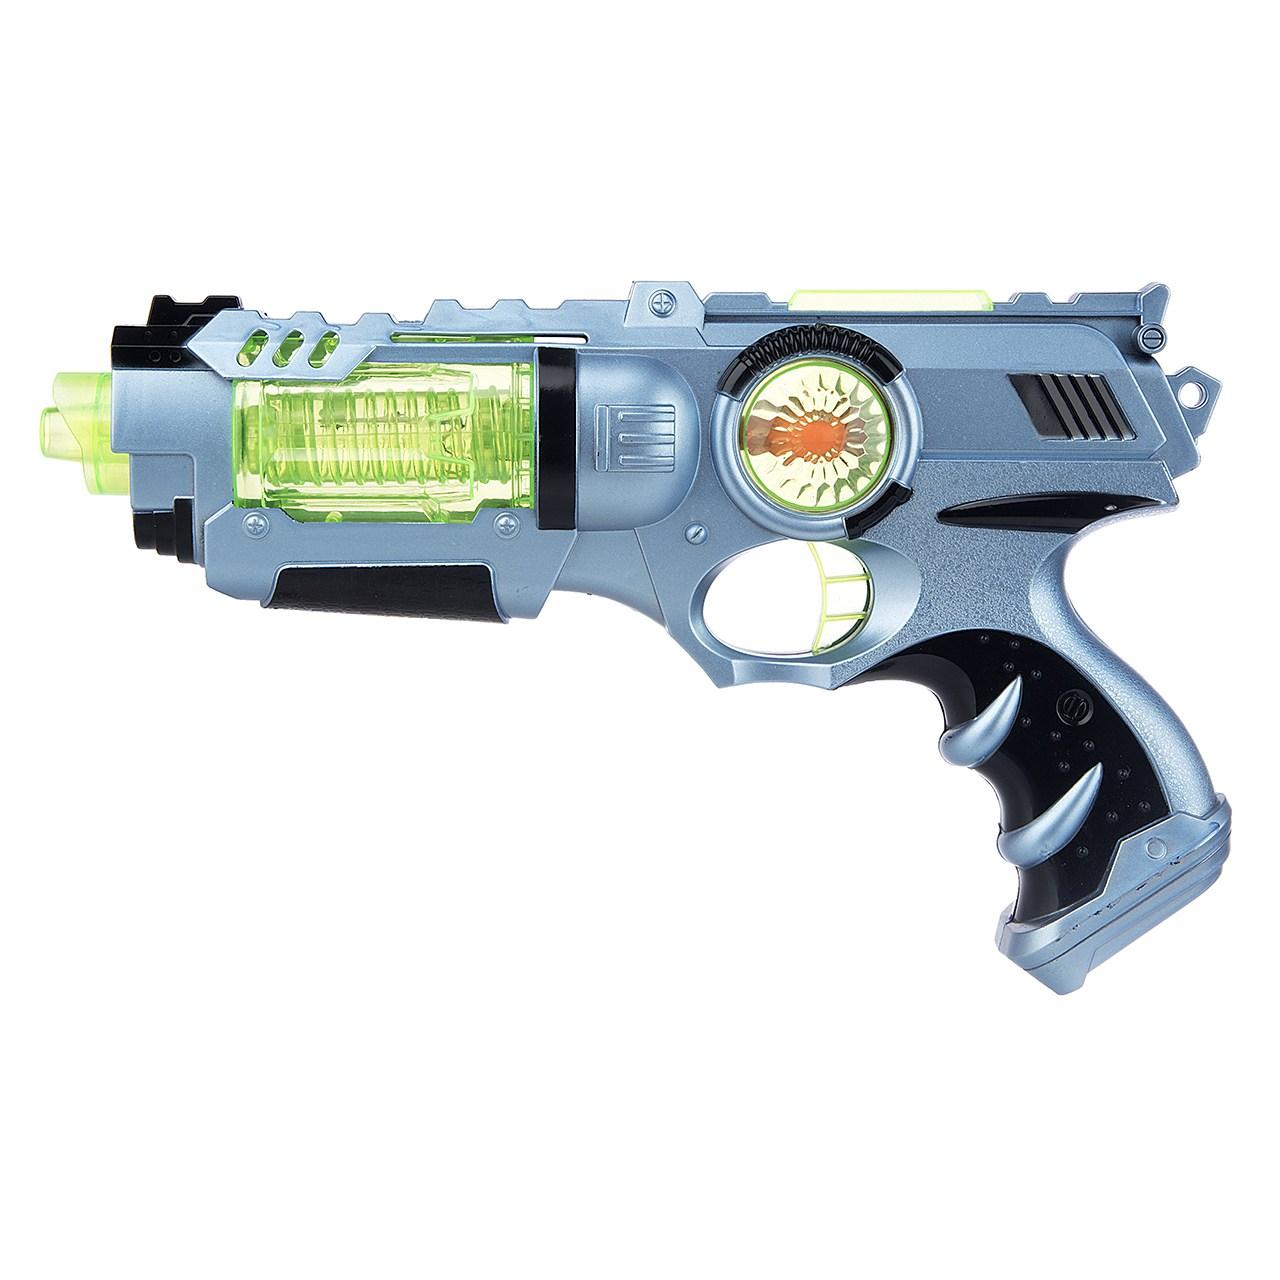 تفنگ اسباب بازی  مدل Space Guardian 829-9